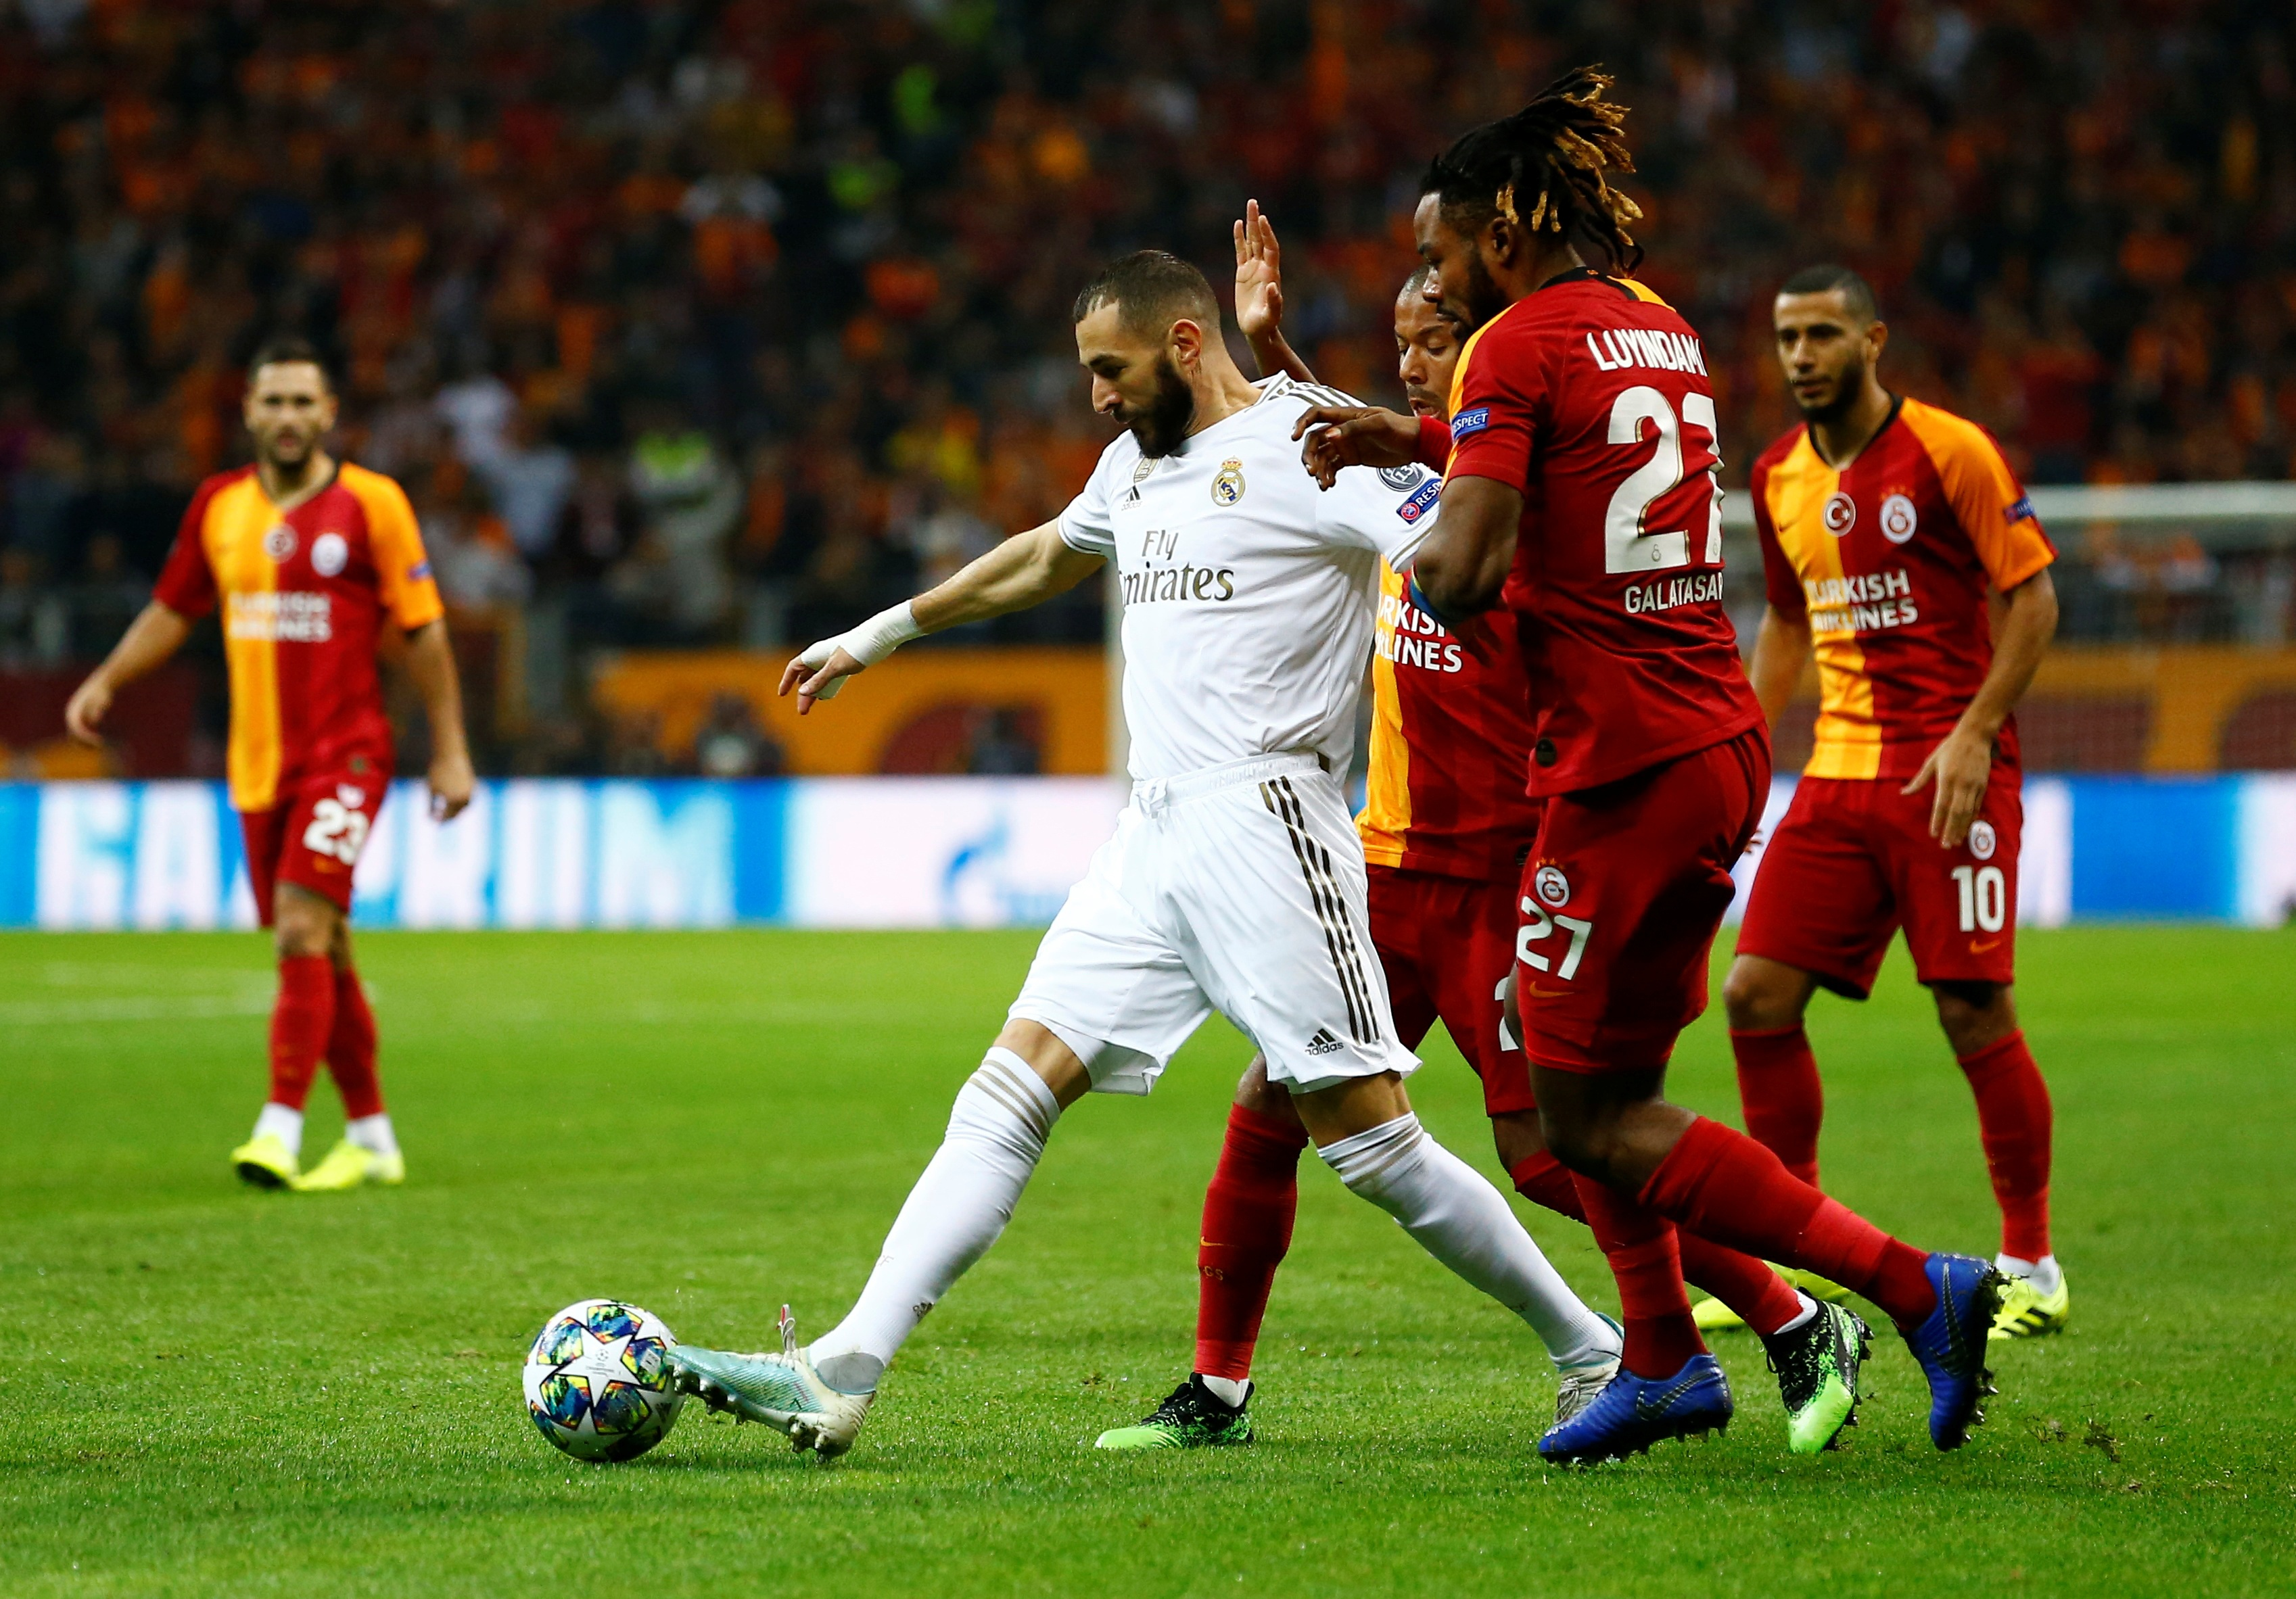 truc tiep Real Madrid va Galatasaray anh 11